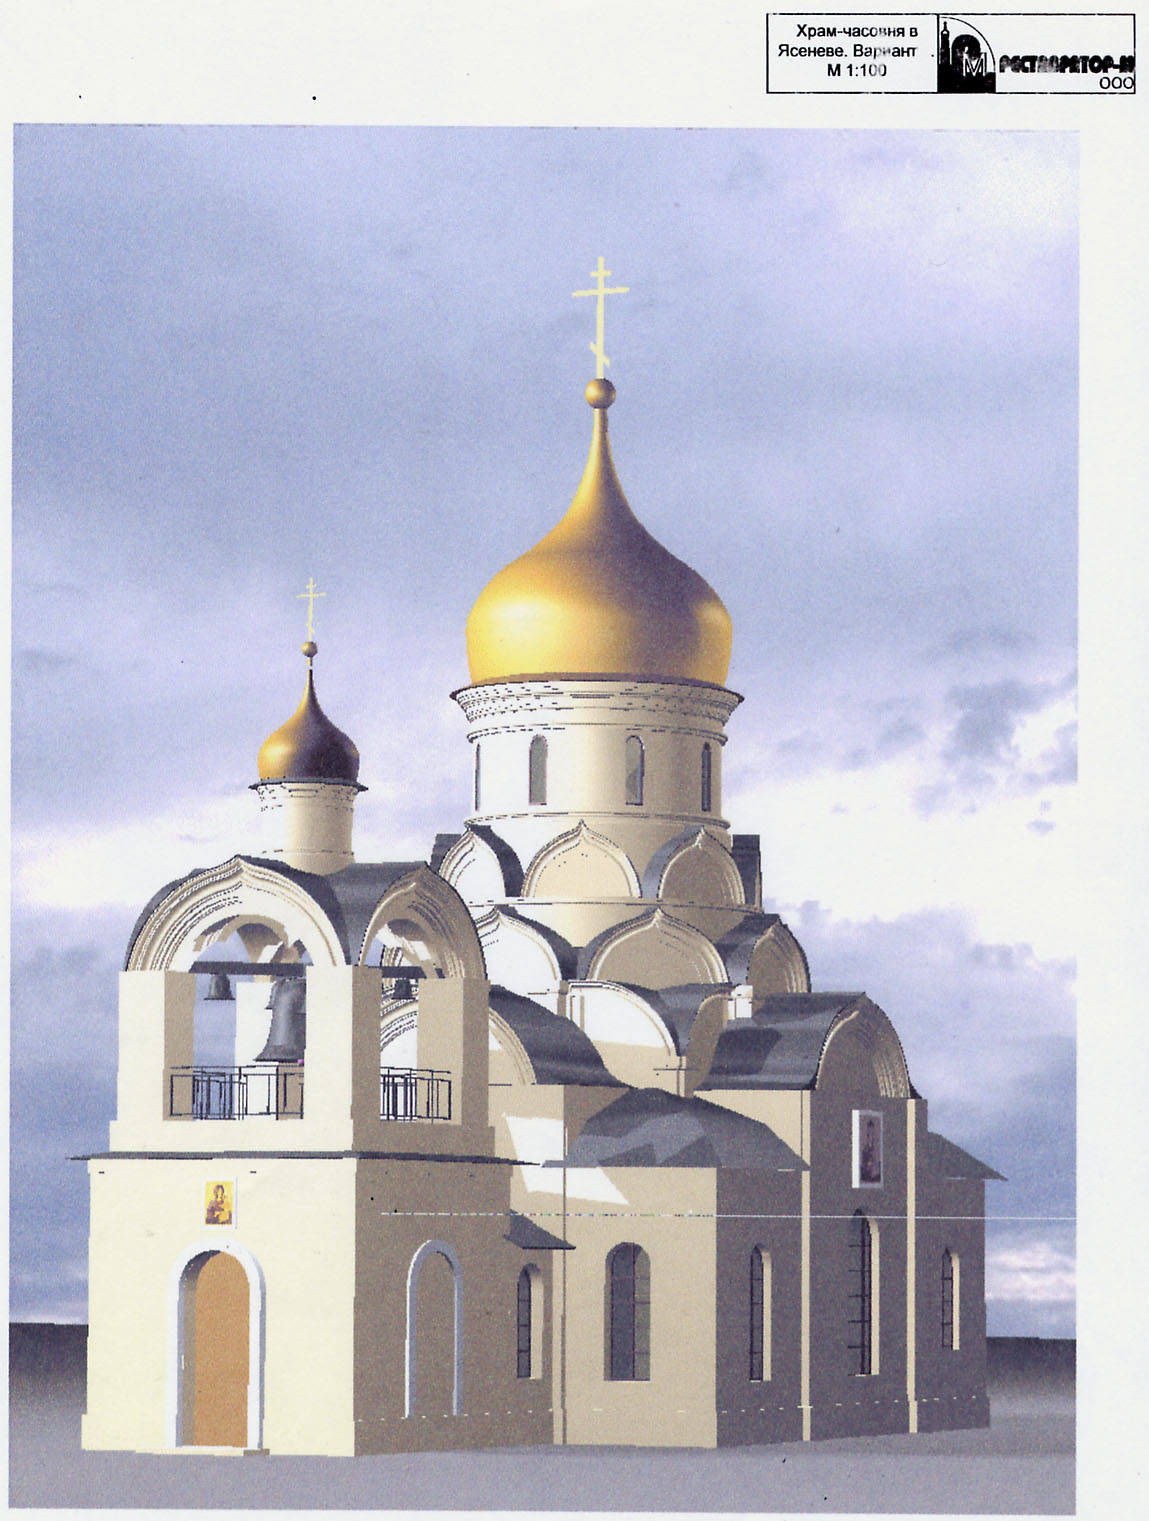 Храм-часовня в Ясенево